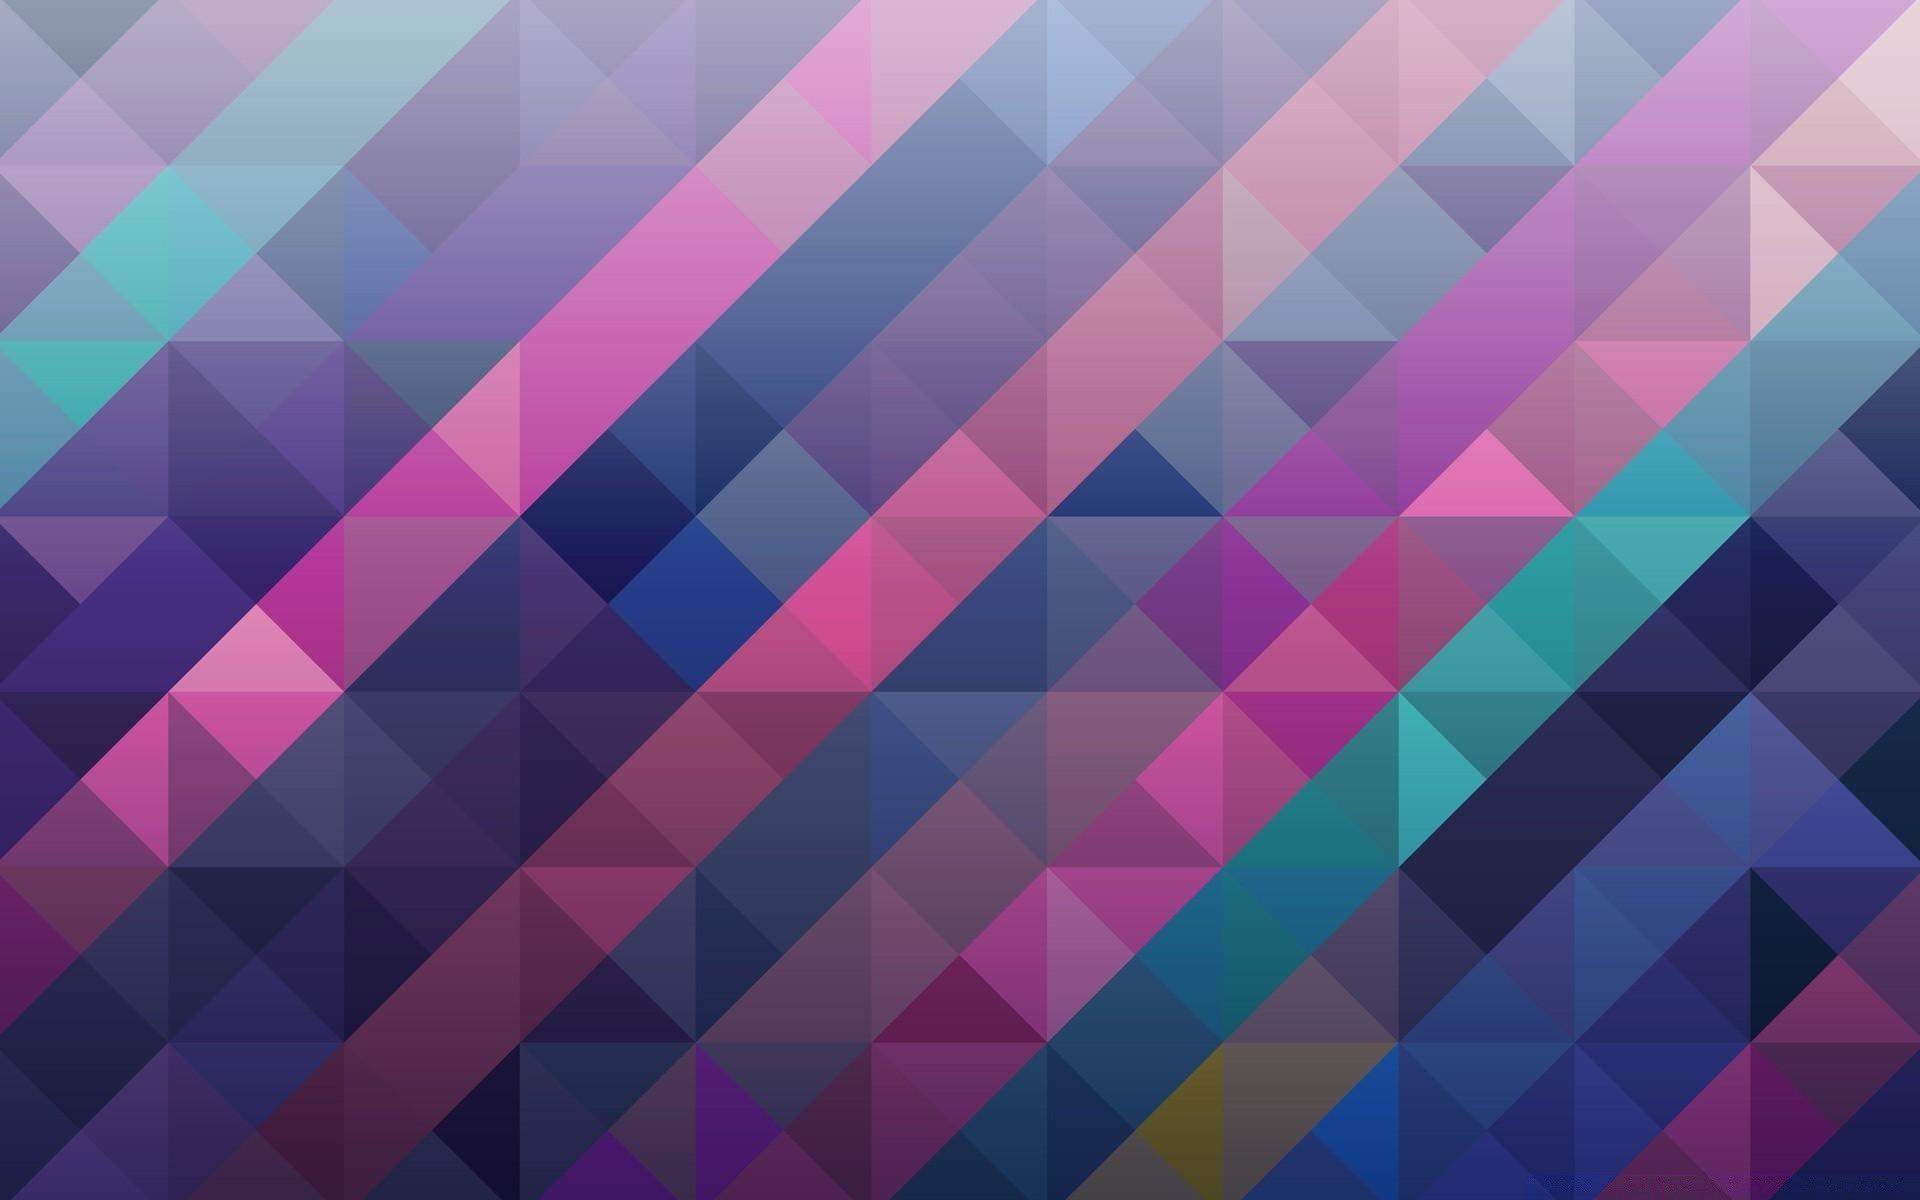 Must see Wallpaper Mac Geometric - 532451525263888  Photograph_583823.jpg